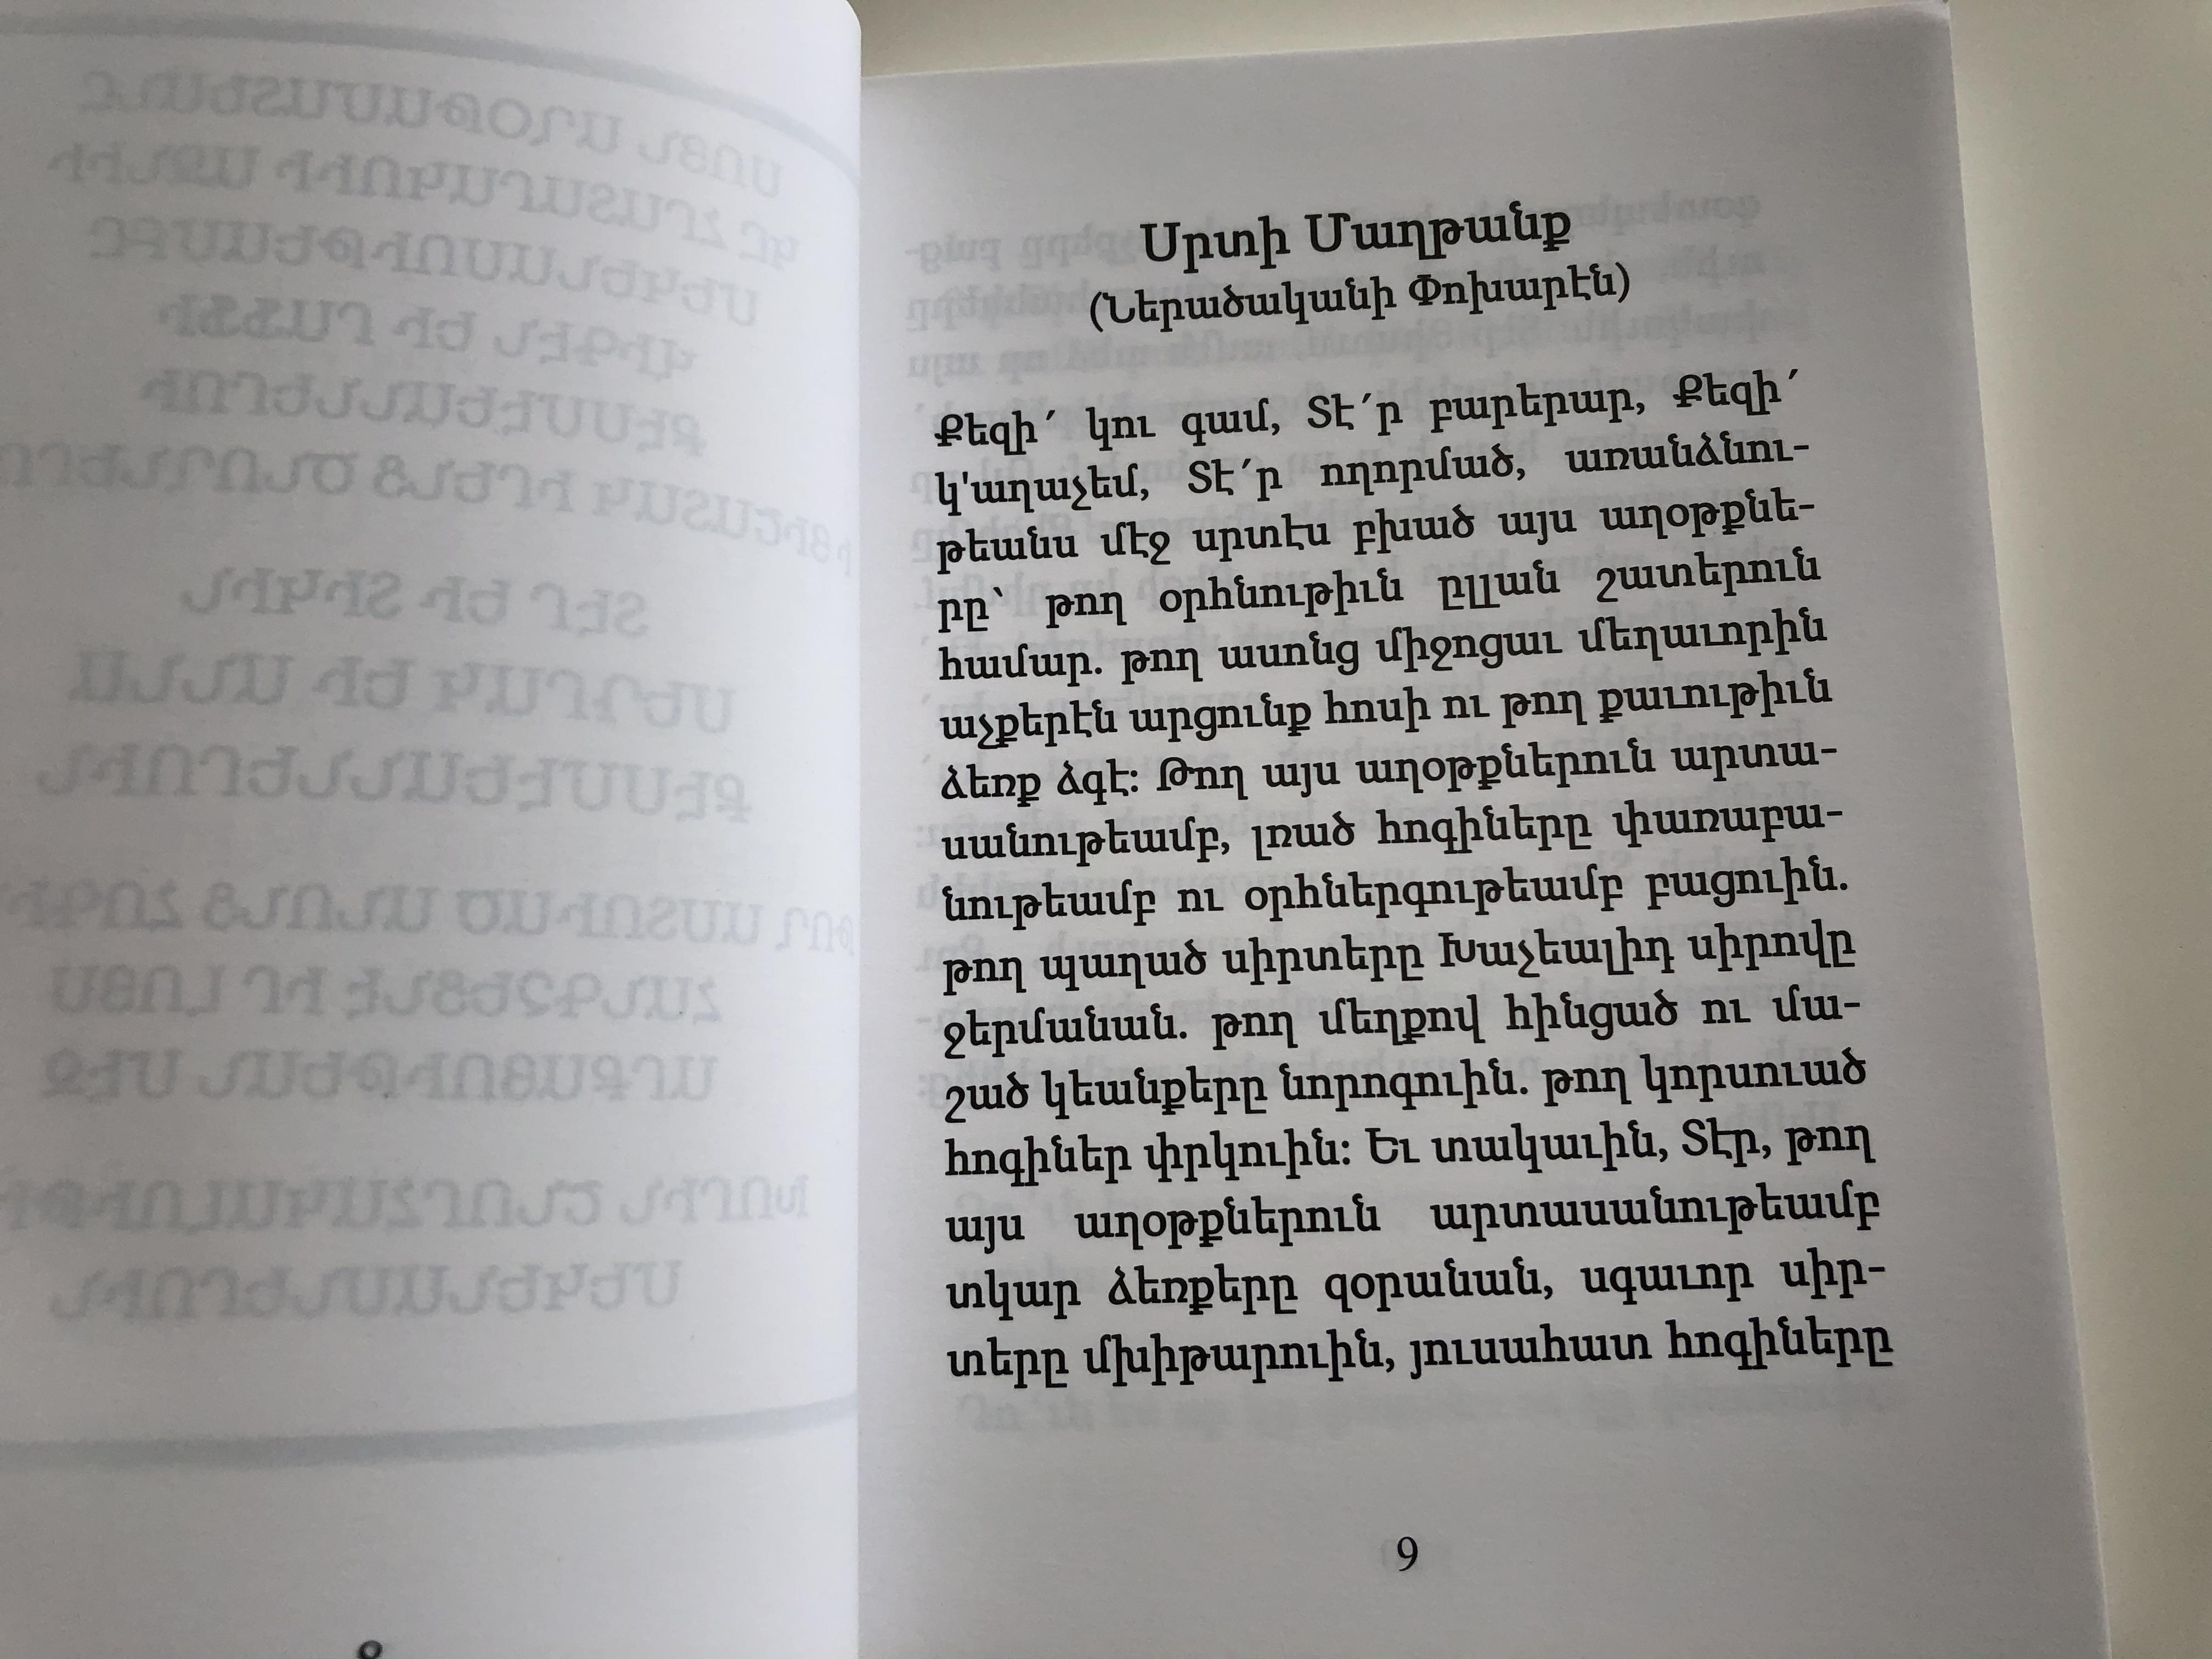 0-8-armenian-language-catholic-prayer-book-5-.jpg